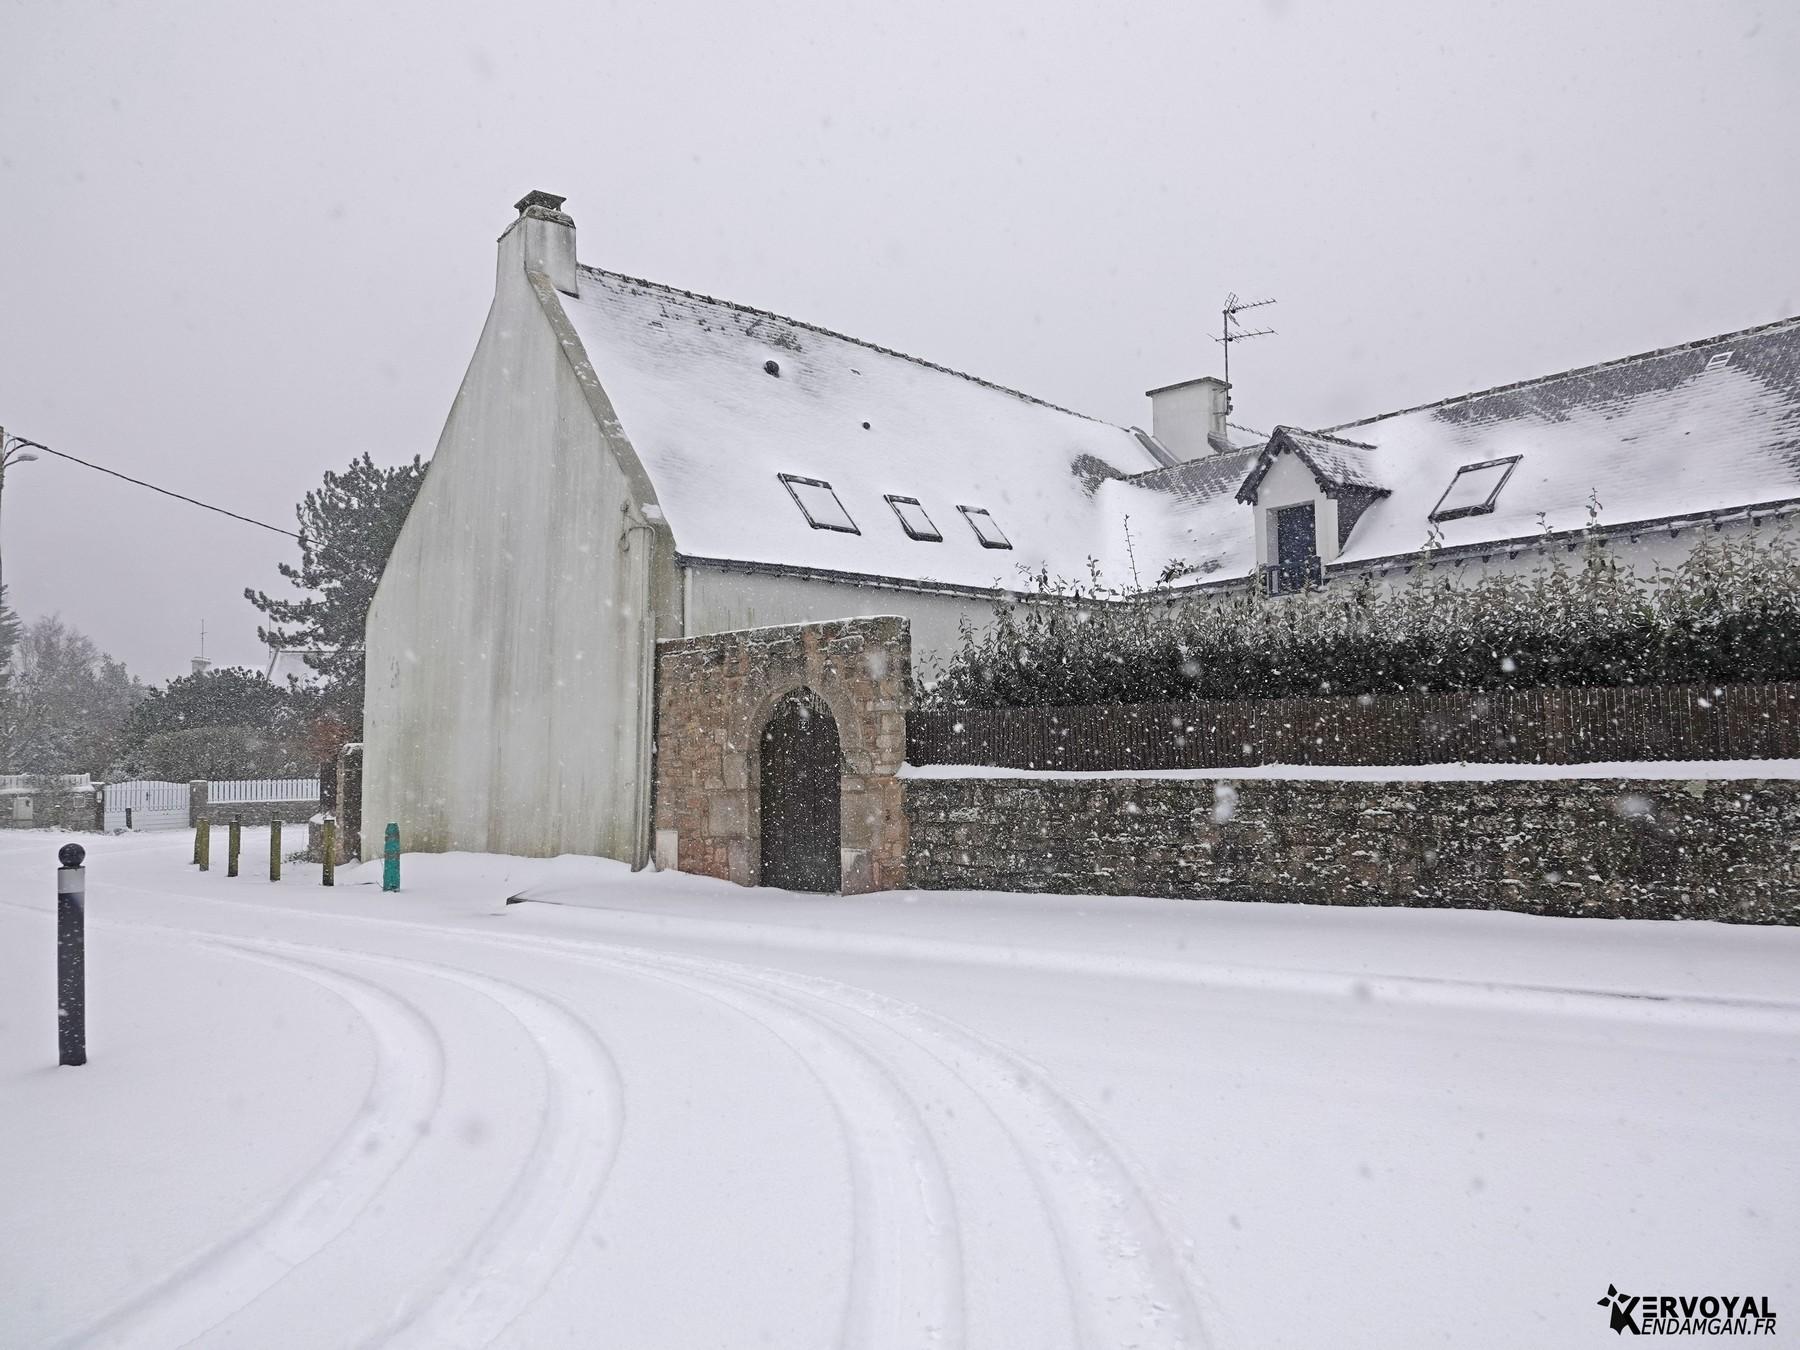 neige à kervoyal 11 février 2021 damgan morbihan (29)